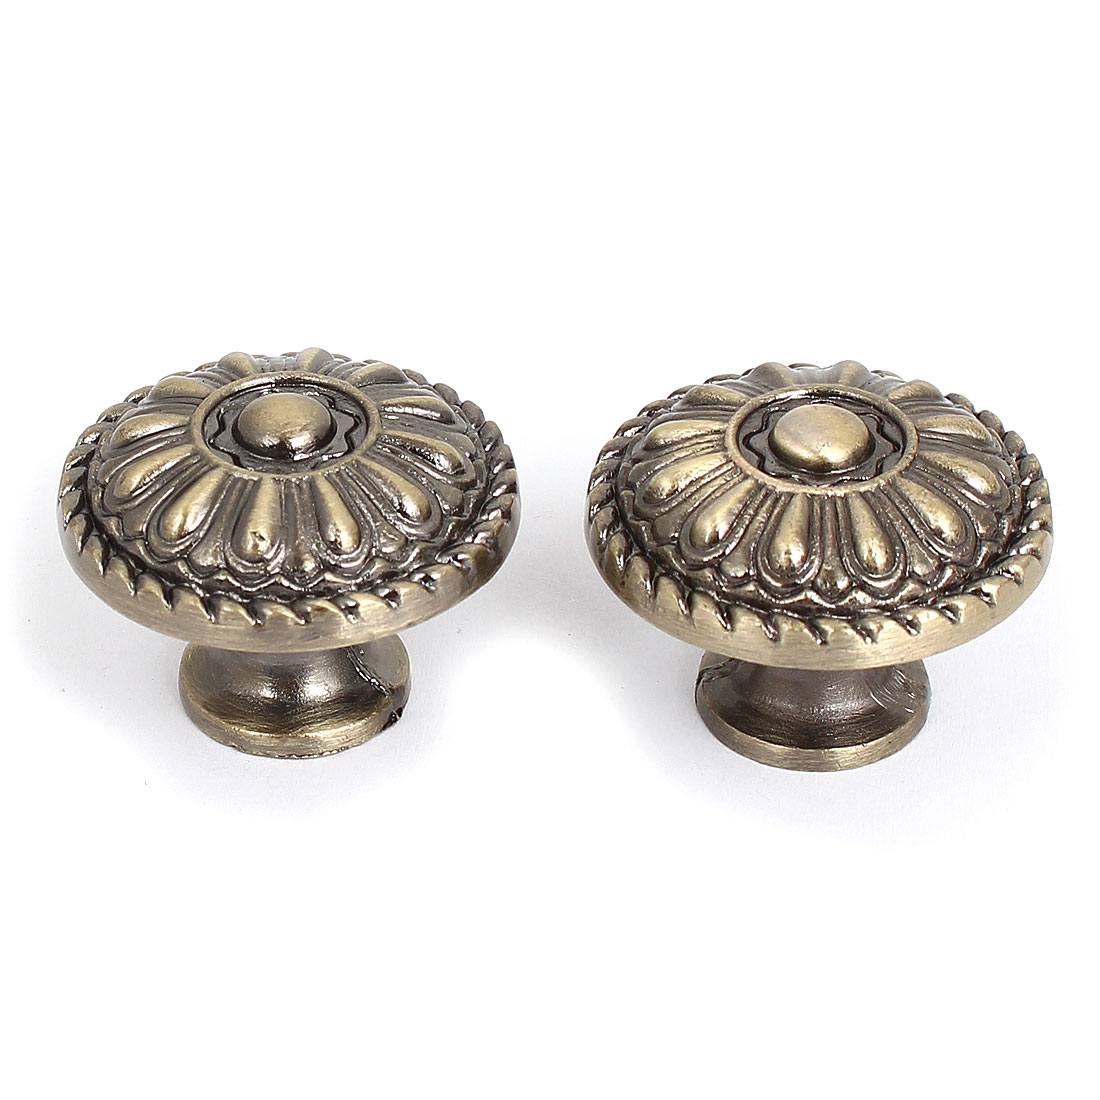 32mm Dia Metal Pull Knob Handle Bronze Tone 2pcs for Cabinet Door Drawer